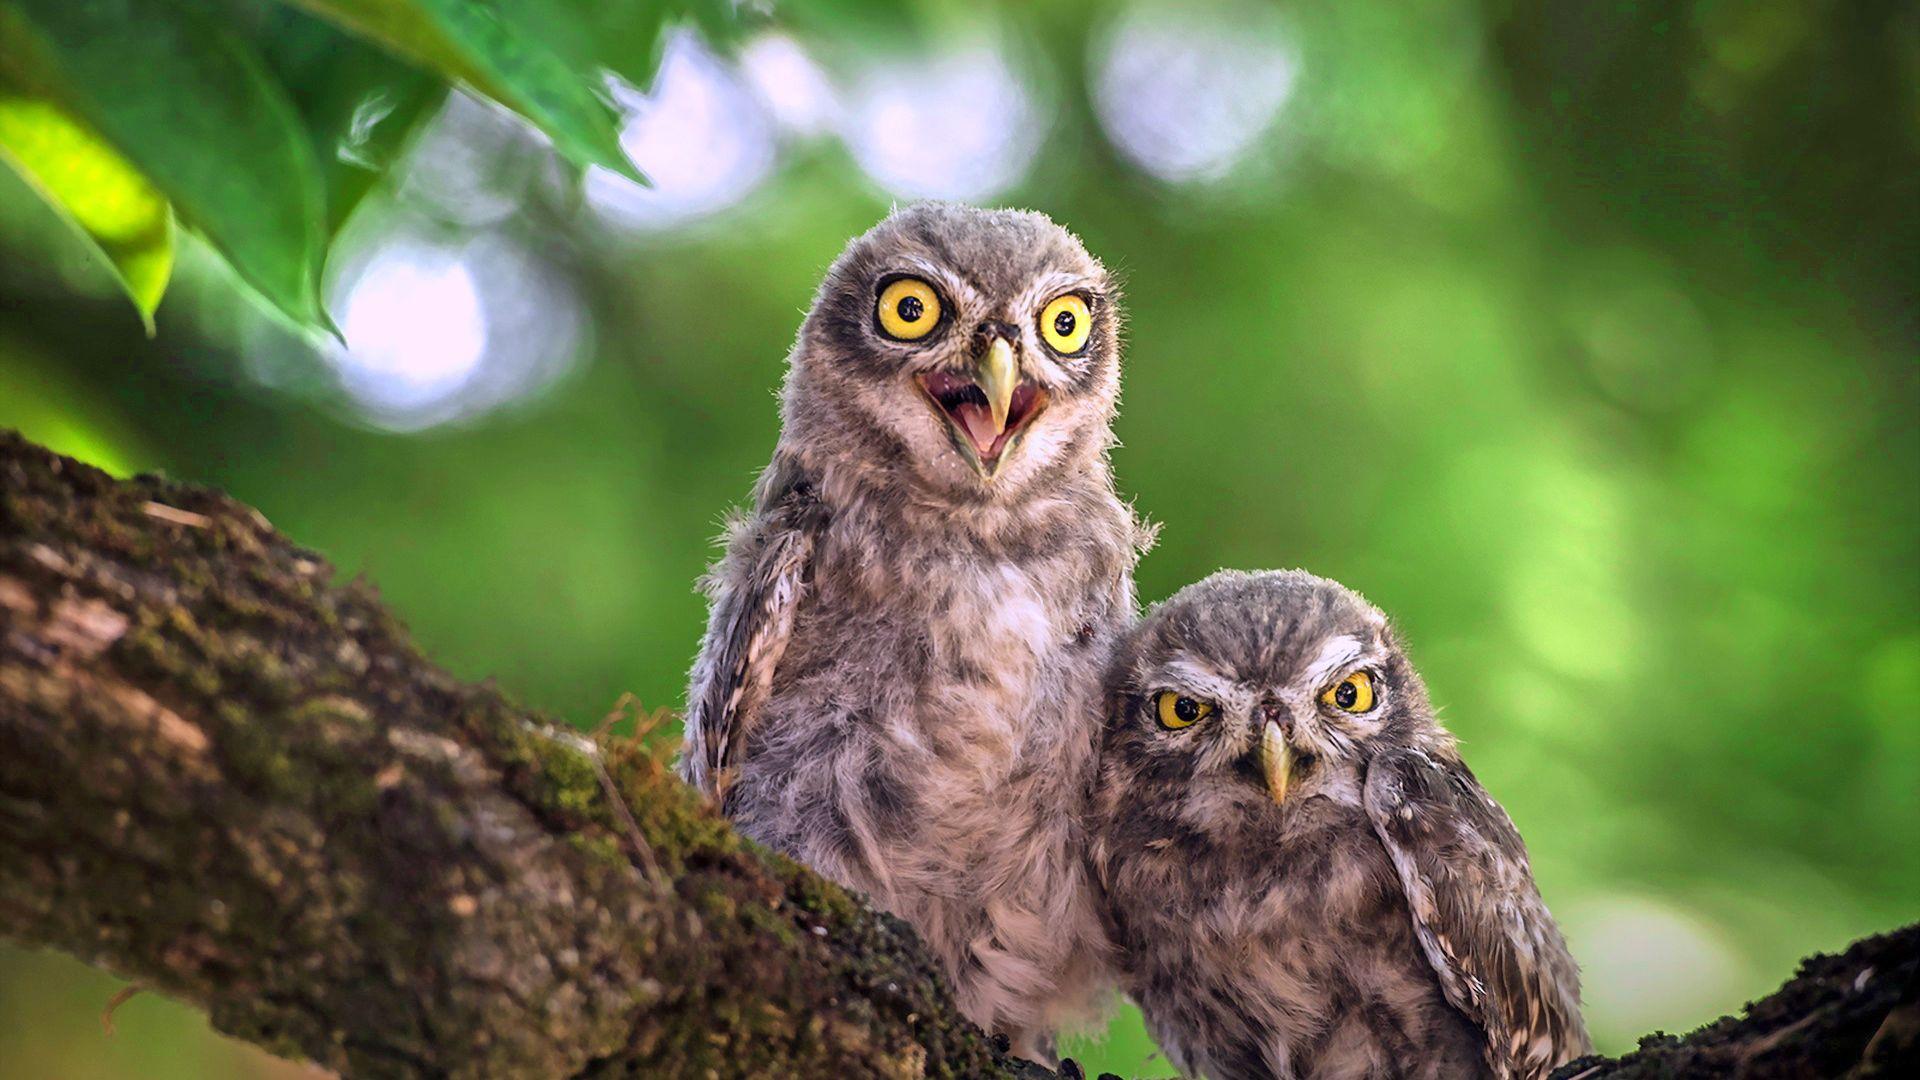 Cute Baby Owl Birds, Sitting Wallpaper, 1920x1200, Hd